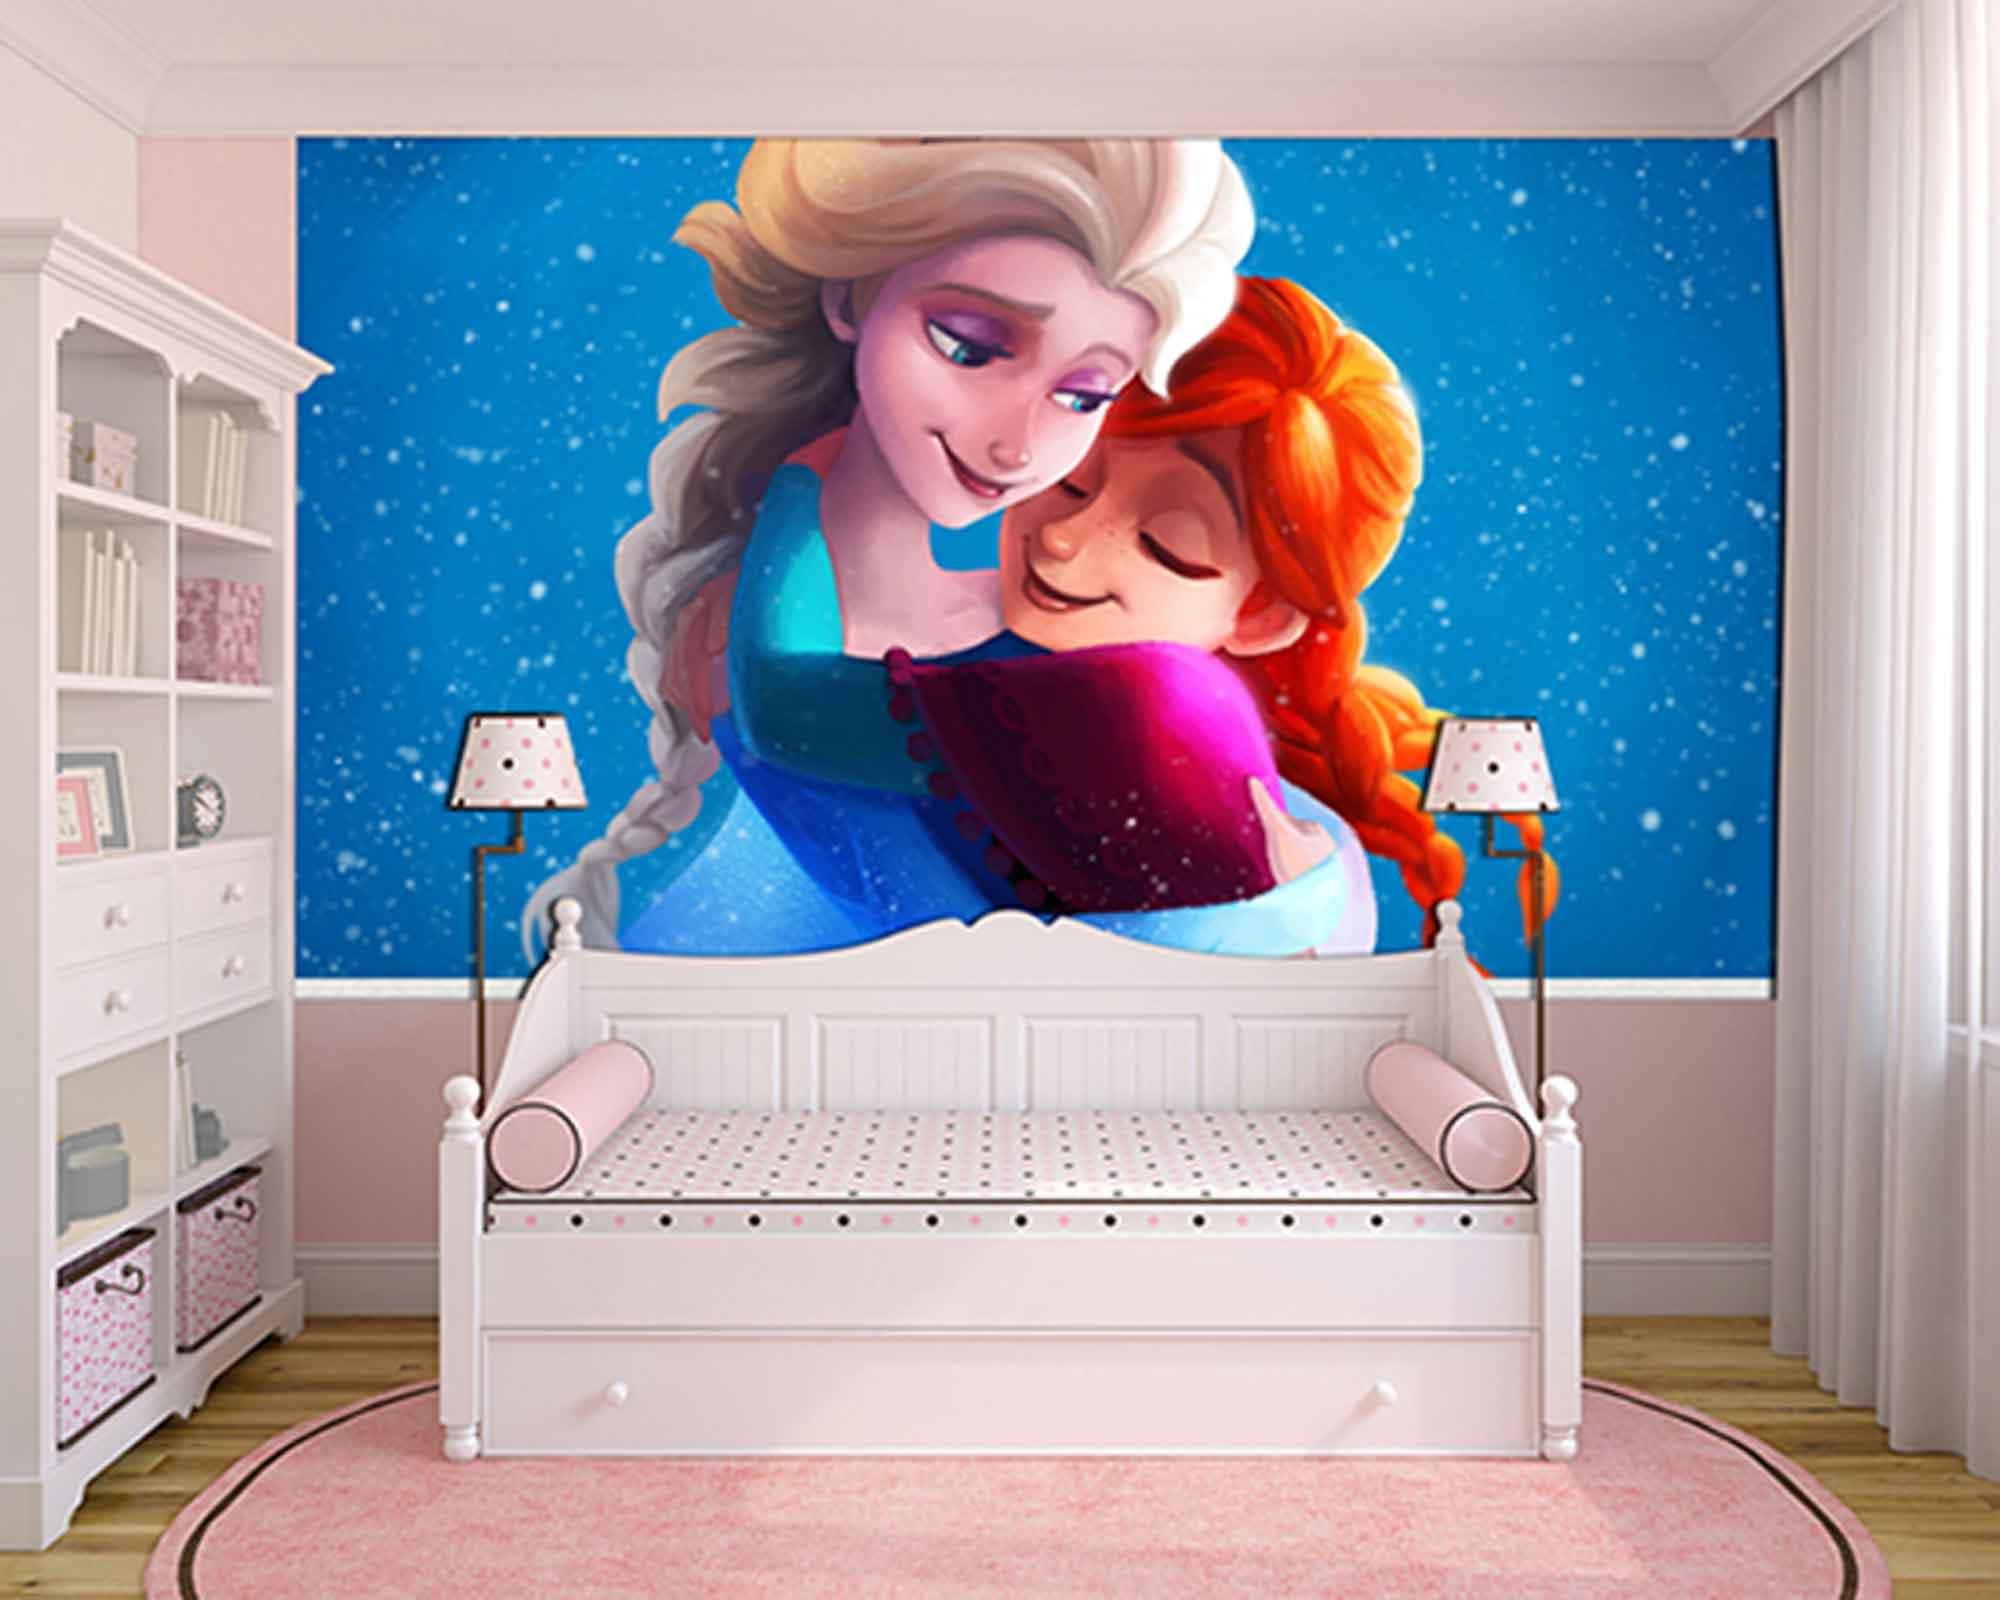 Papel de Parede Infantil Frozen 0016 - Papel de Parede para Quarto  - Paredes Decoradas